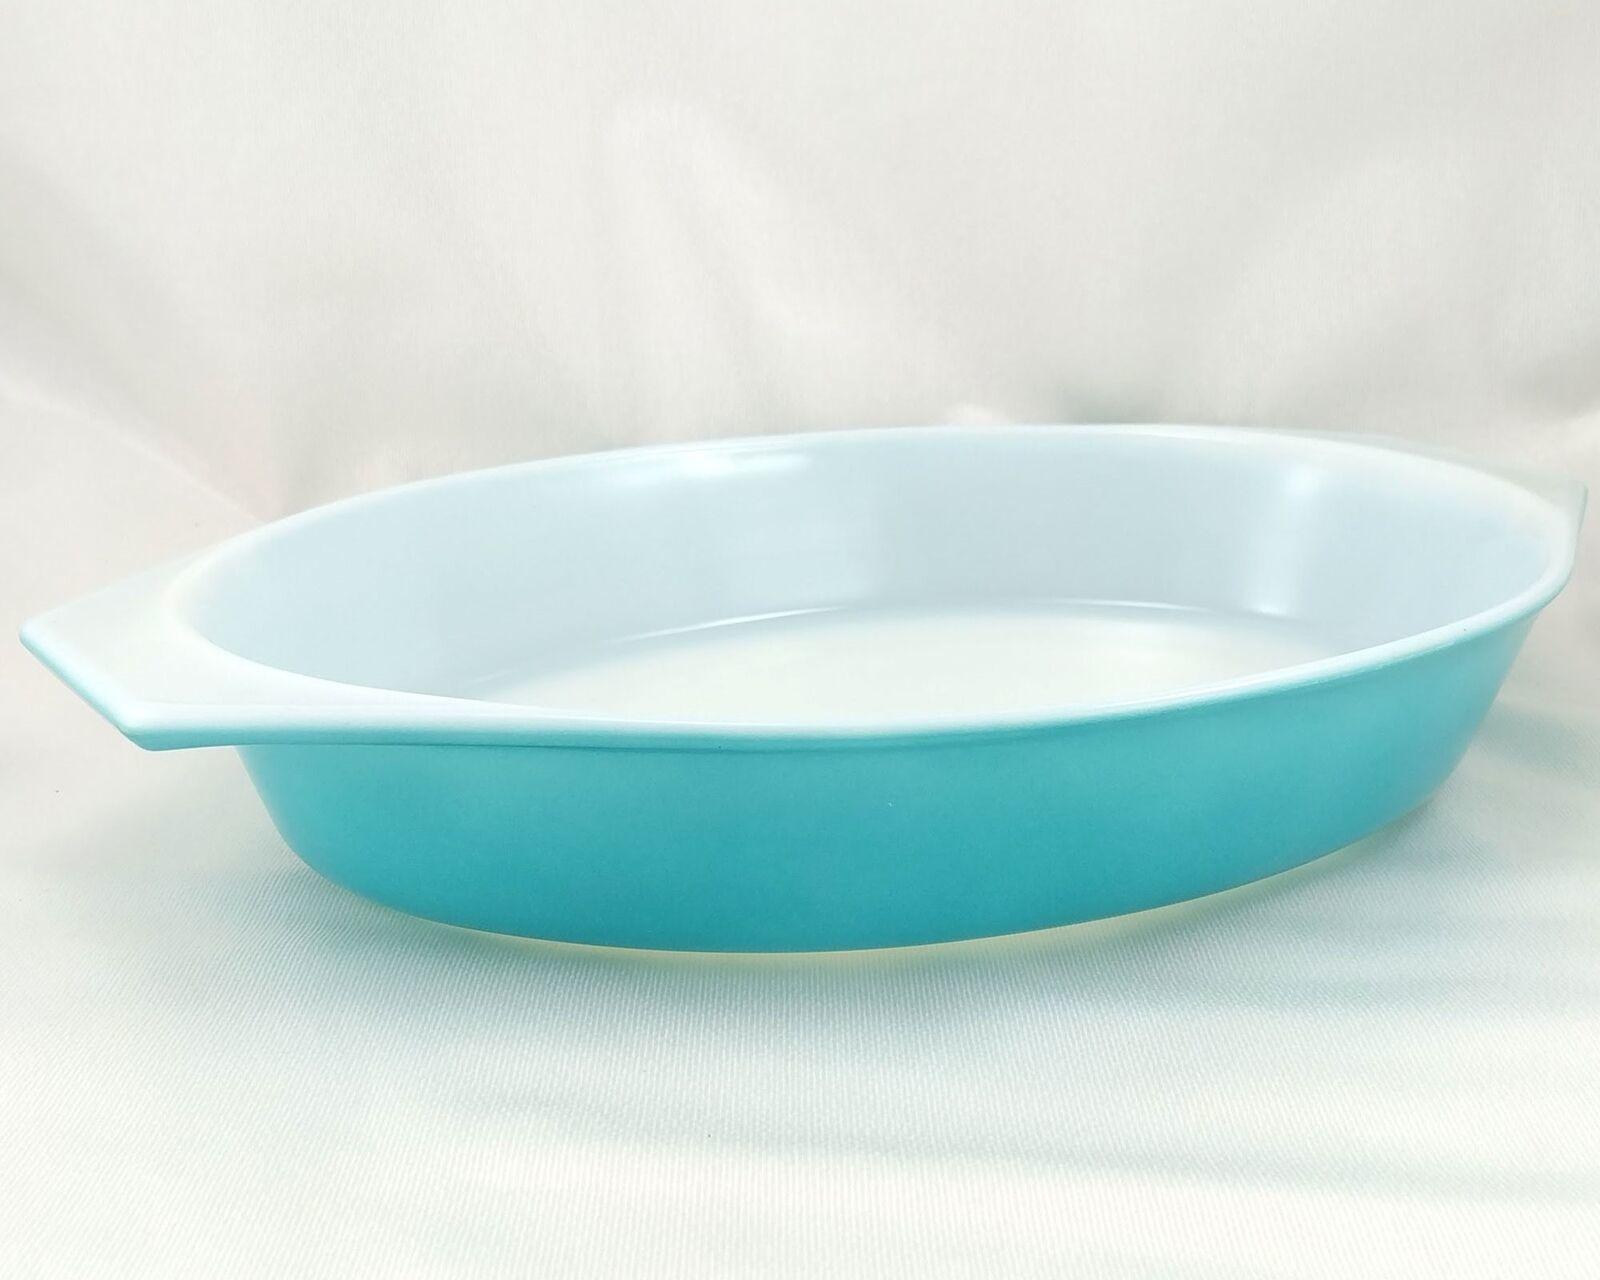 Pyrex Turquoise Oval Princess 1½ qt Casserole Dish Gold Color Scroll 945C Lid image 3